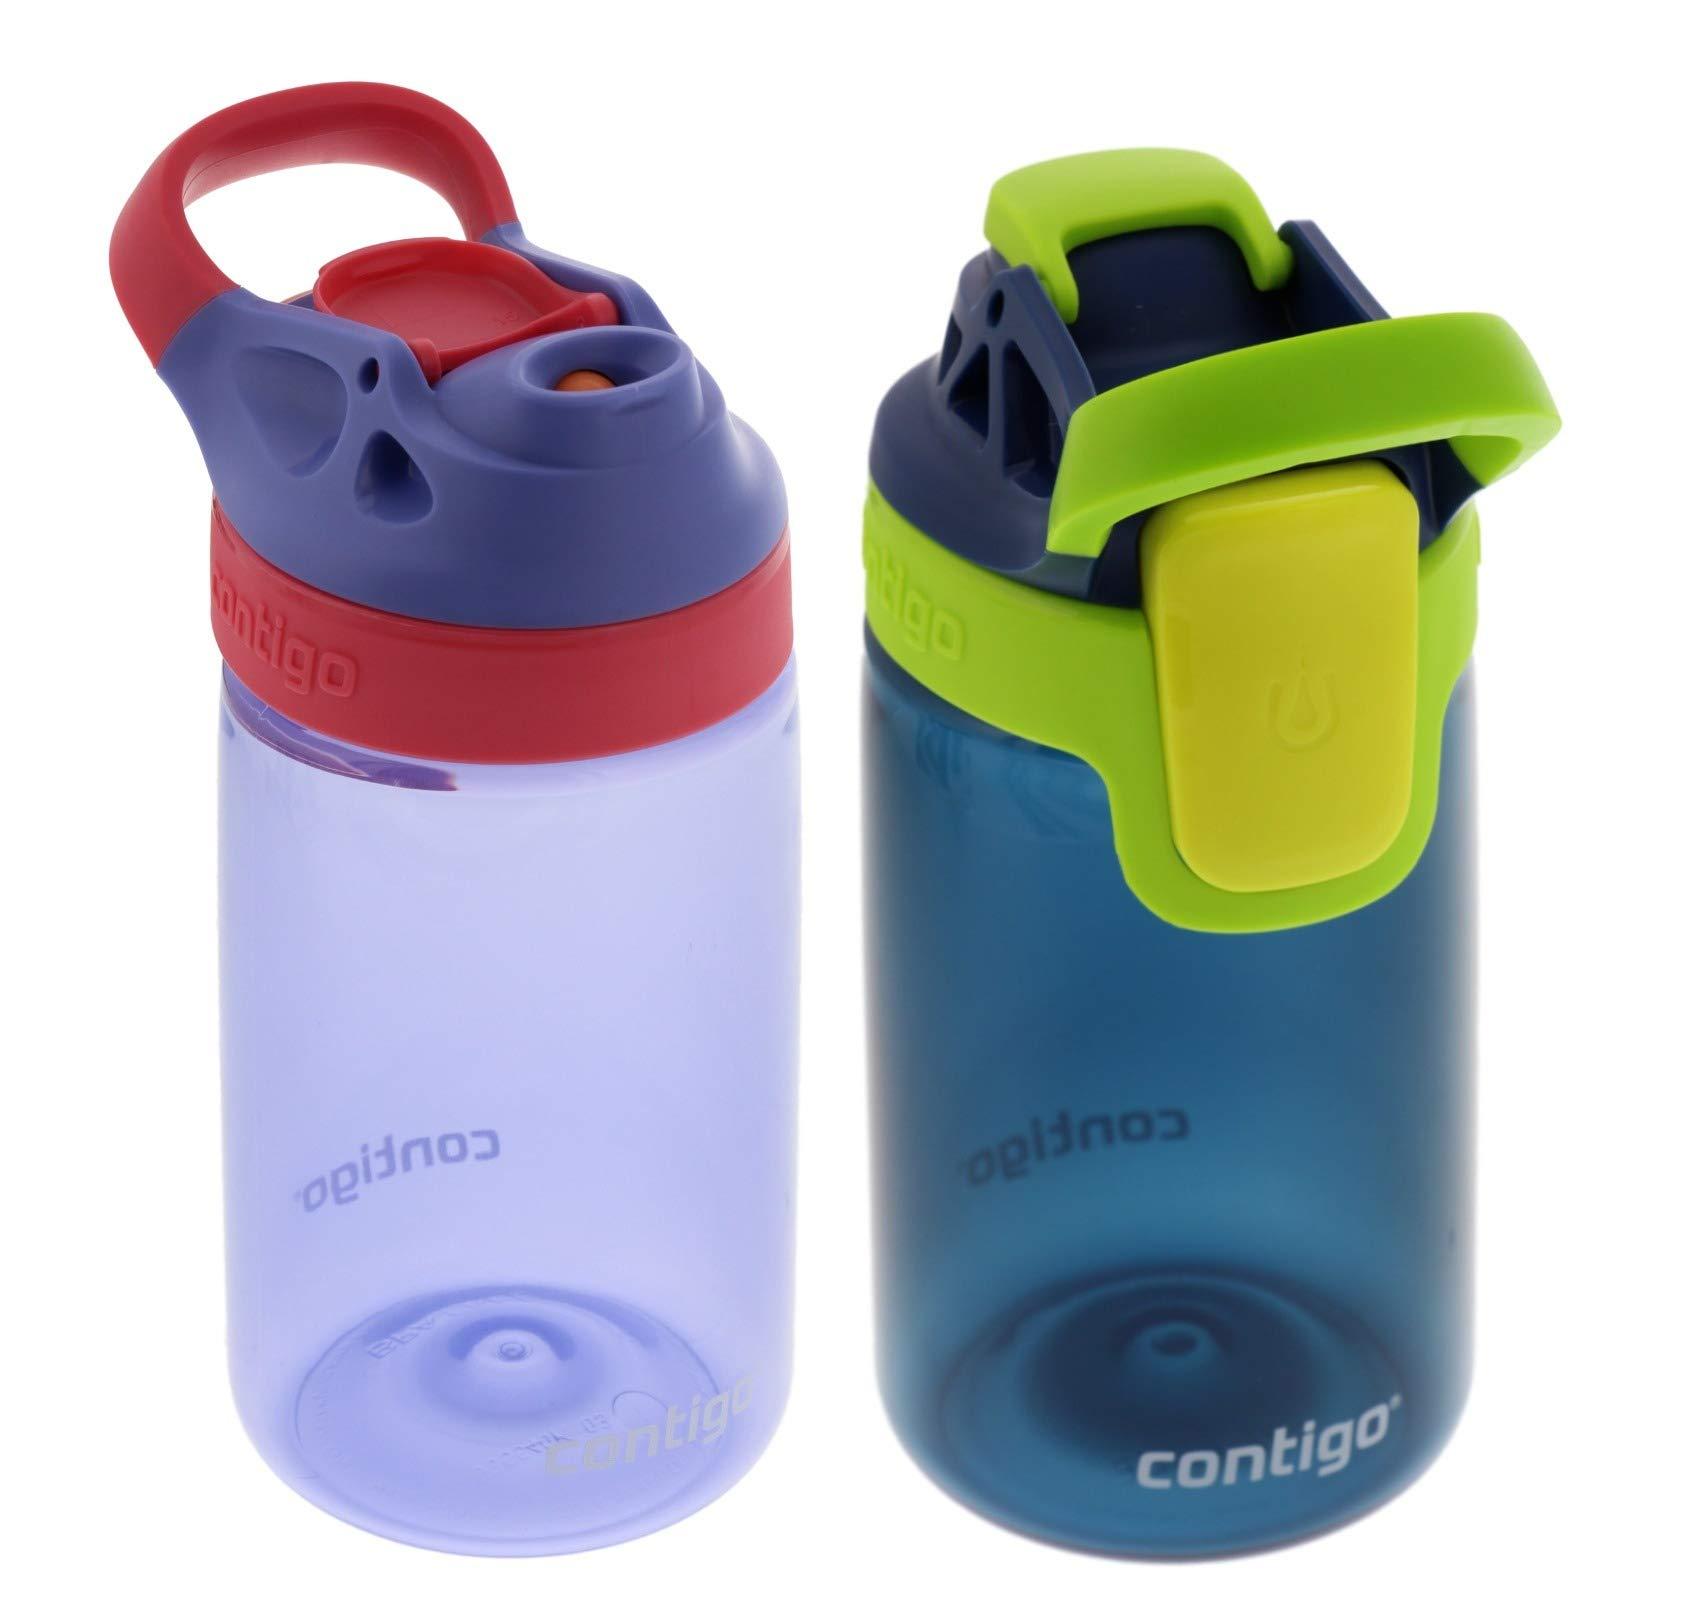 Contigo 14oz Kids Autoseal Gizmo Sip Water Bottles, Lavender & Navy (2 Pack) - Perfect Children & Parents on the Go